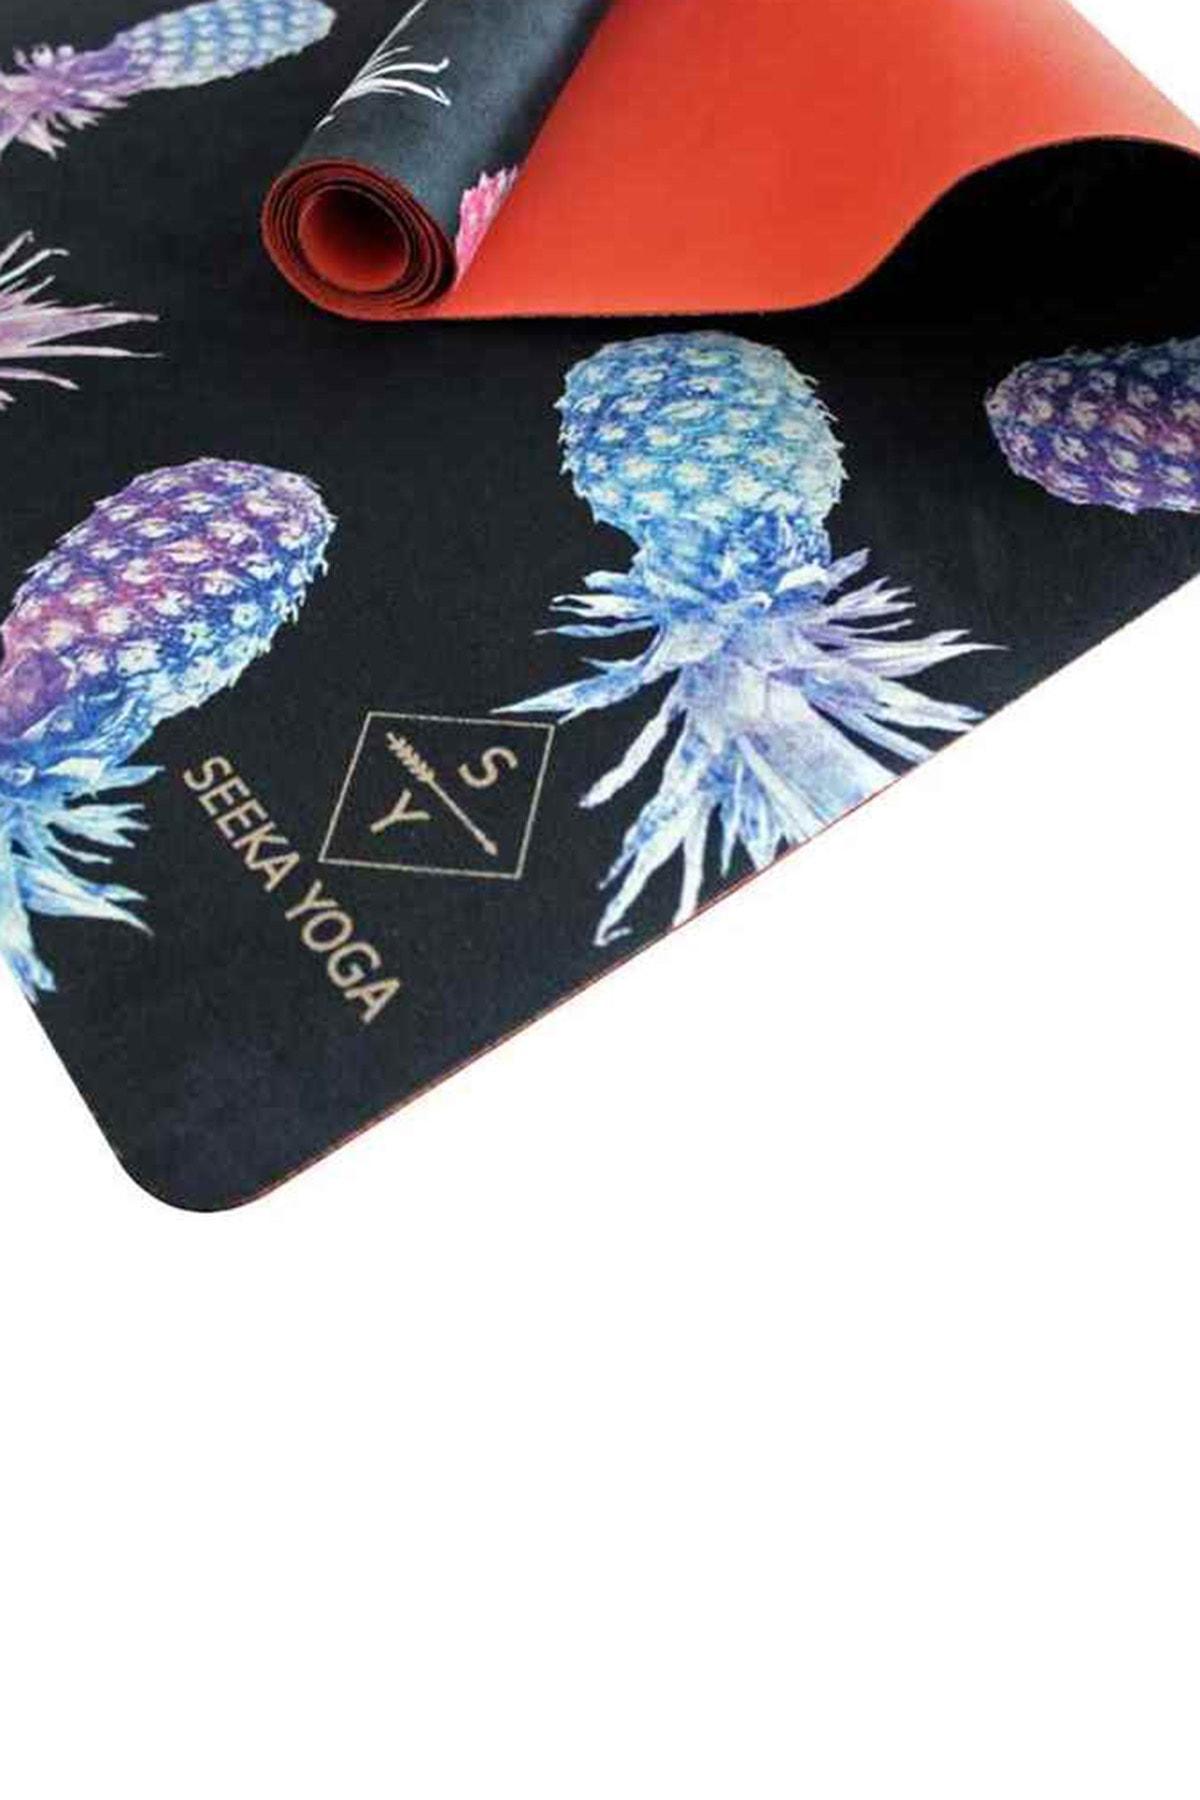 Seeka Yoga Seeka Mikrofiber Yüzeyli Travel Yoga Matı - Pıneapple 1